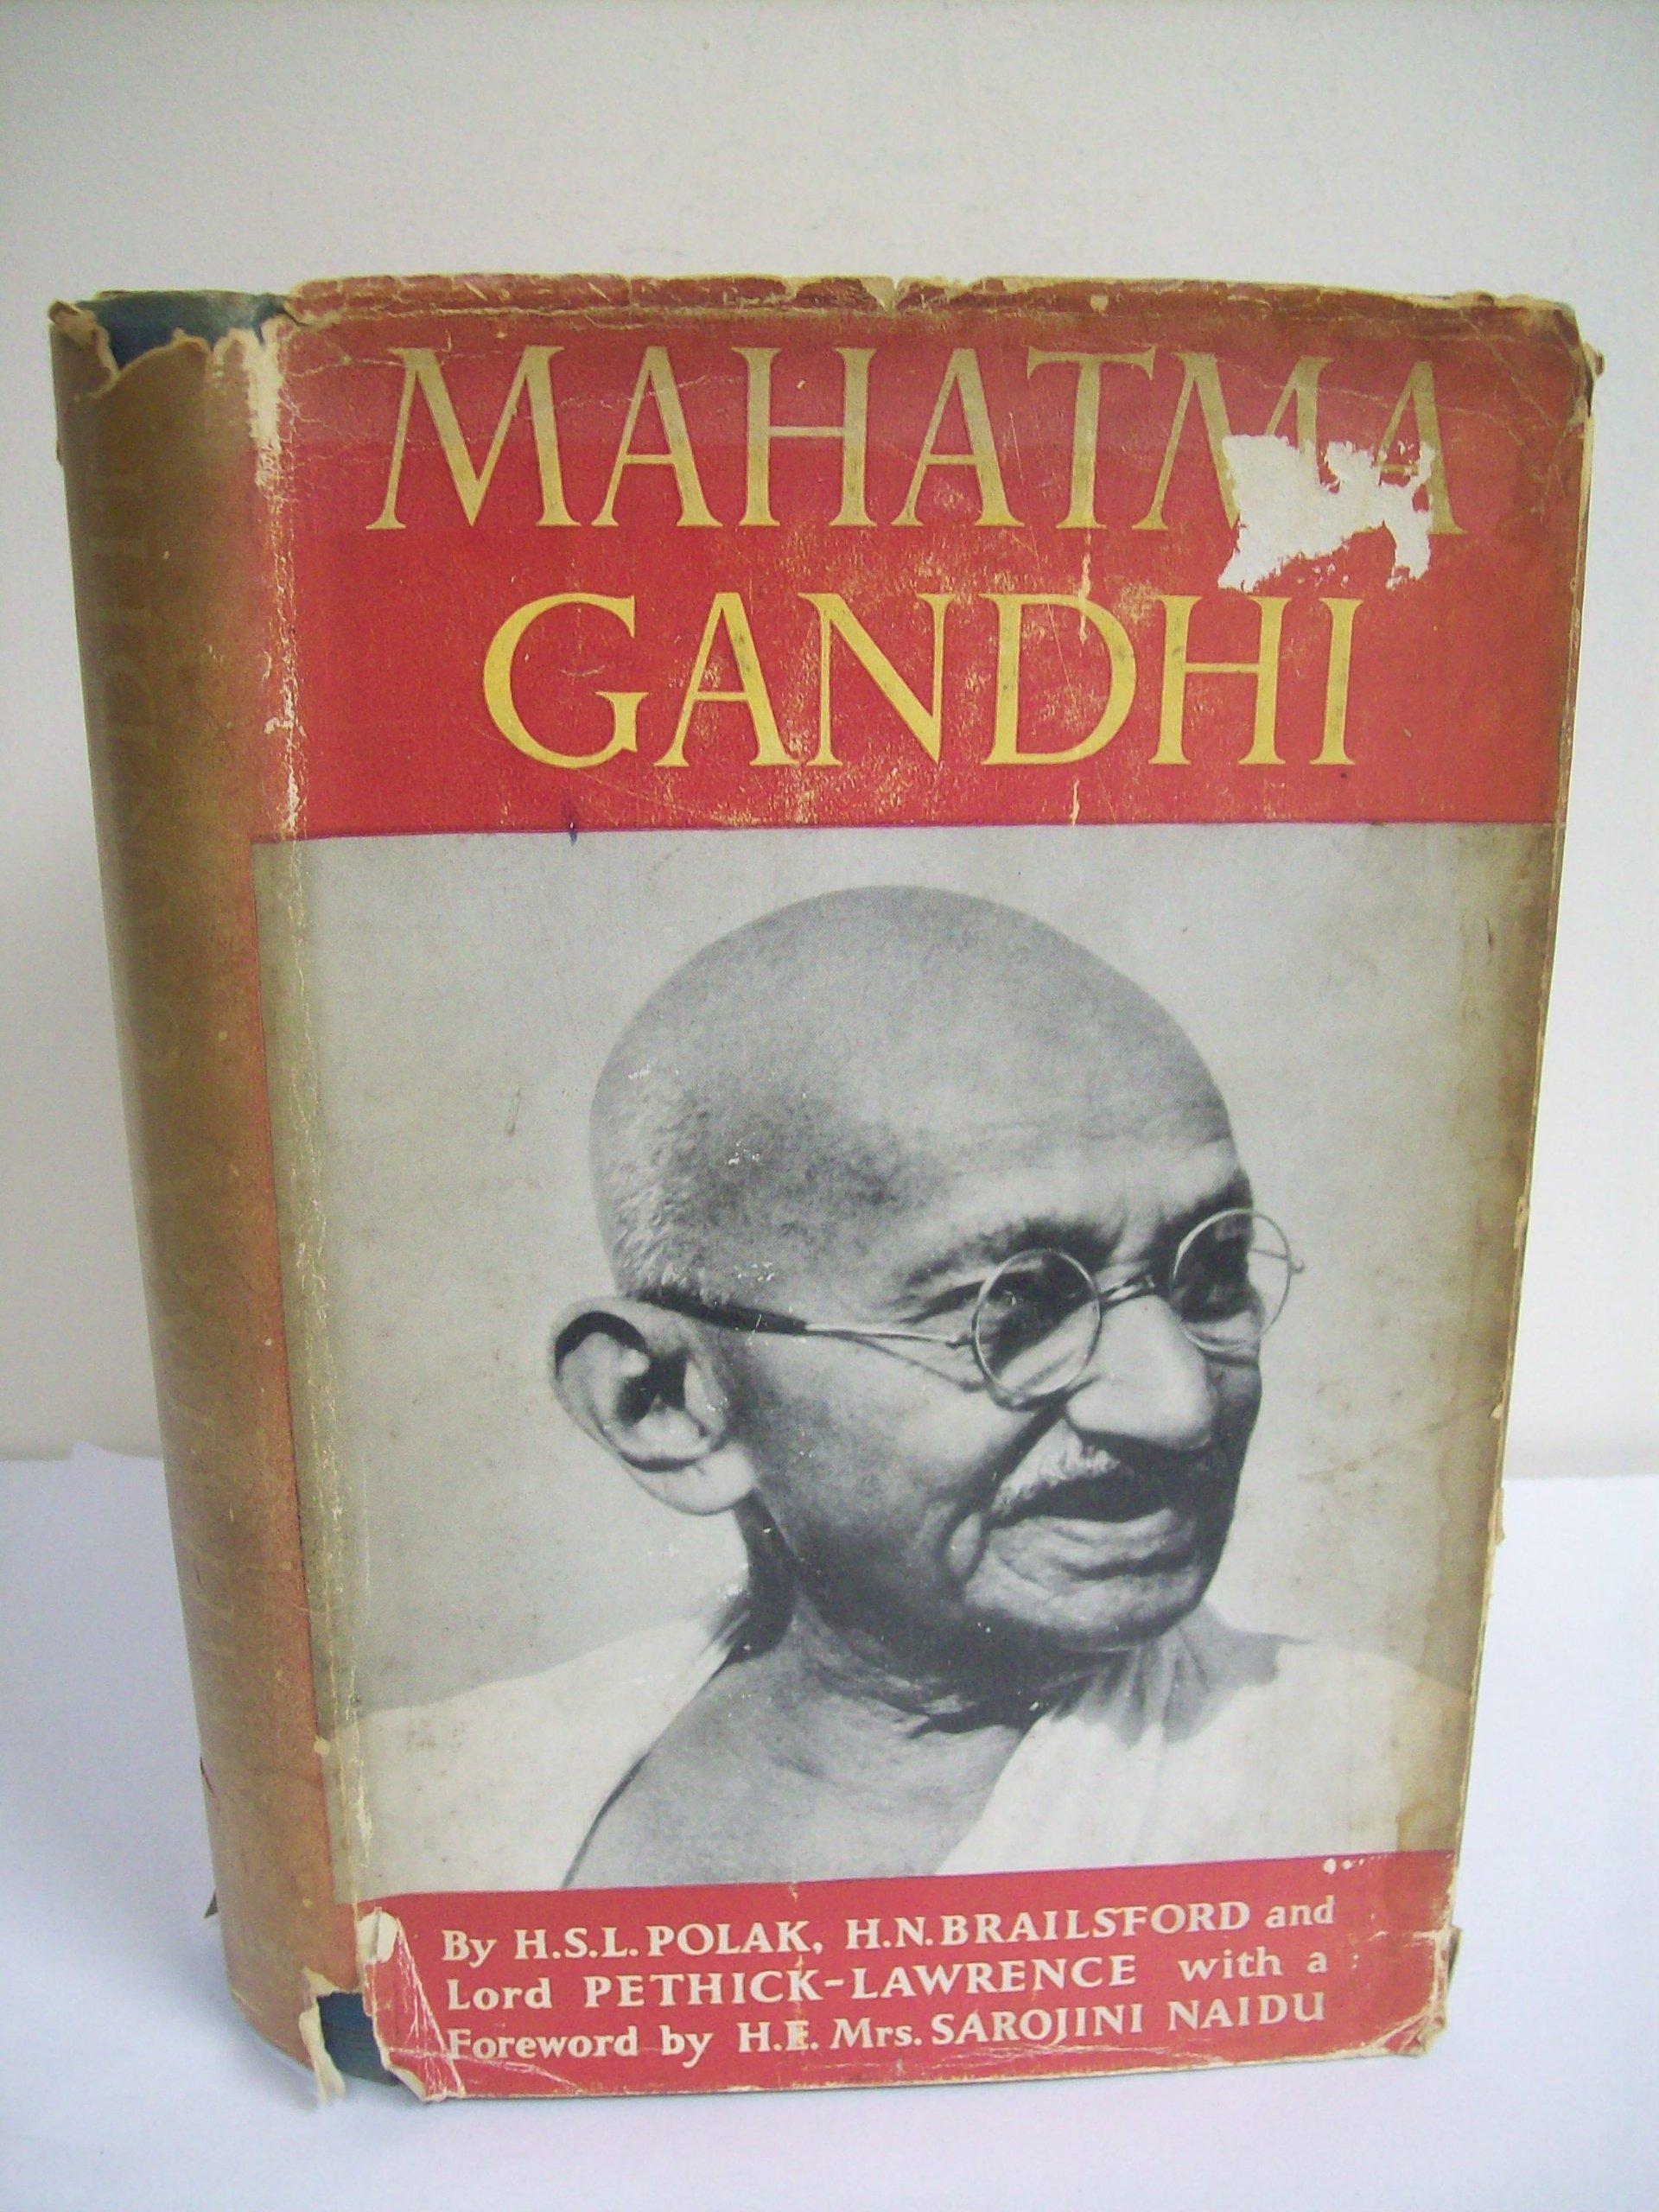 Mahatma Gandhi: Amazon.es: H Brailsford, H Pethick-Lawrence, L Polak: Libros